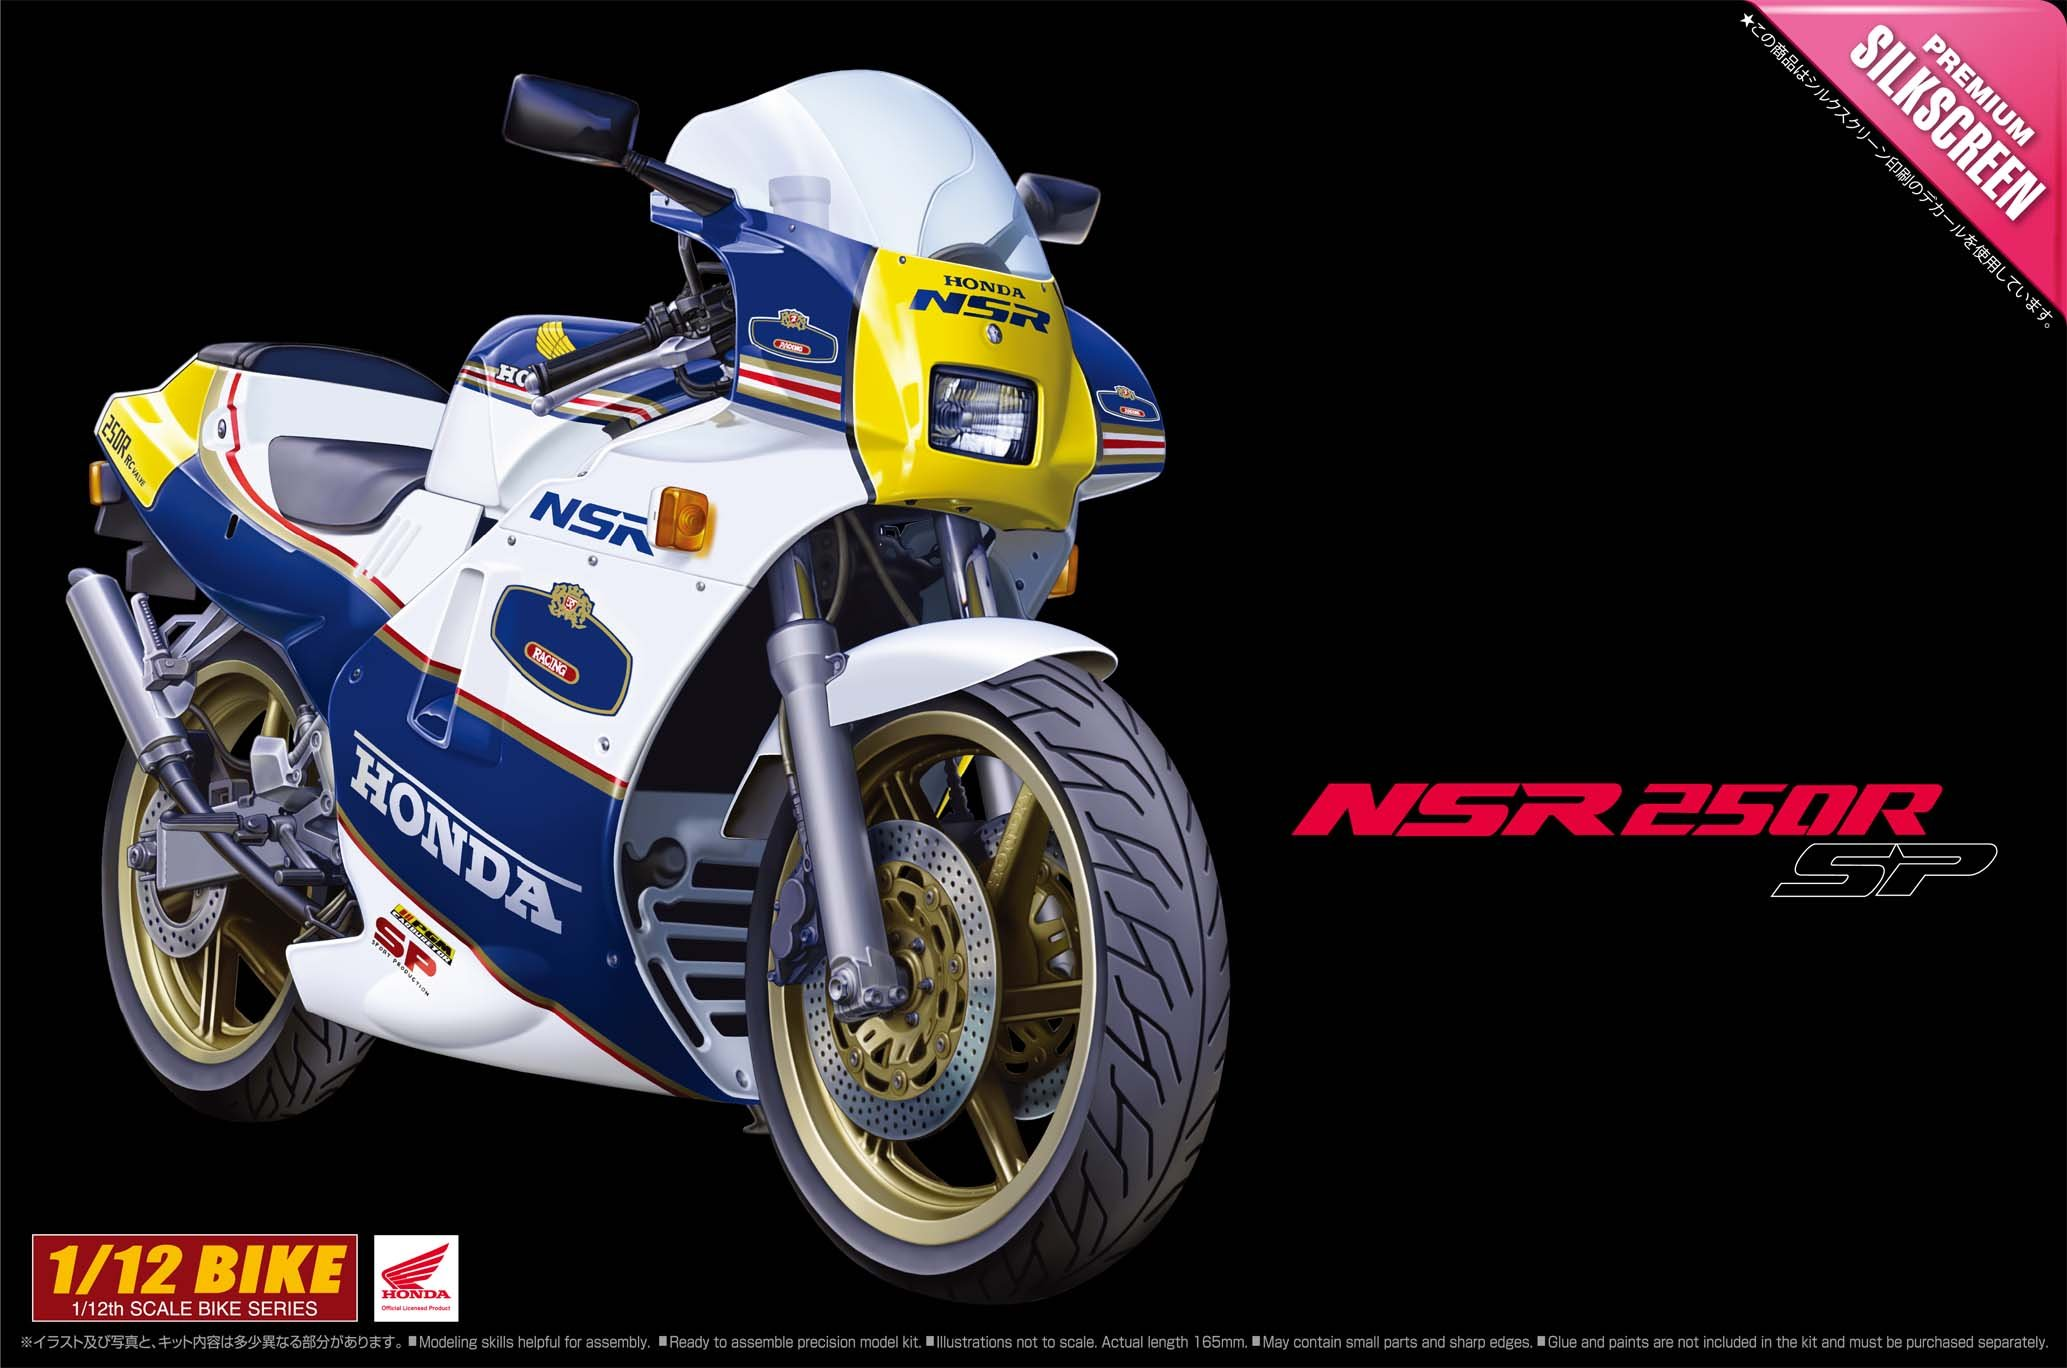 Aoshima Models Honda NSR250R SP 1988 Motorcycle Model Building Kit, 1/12 Scale